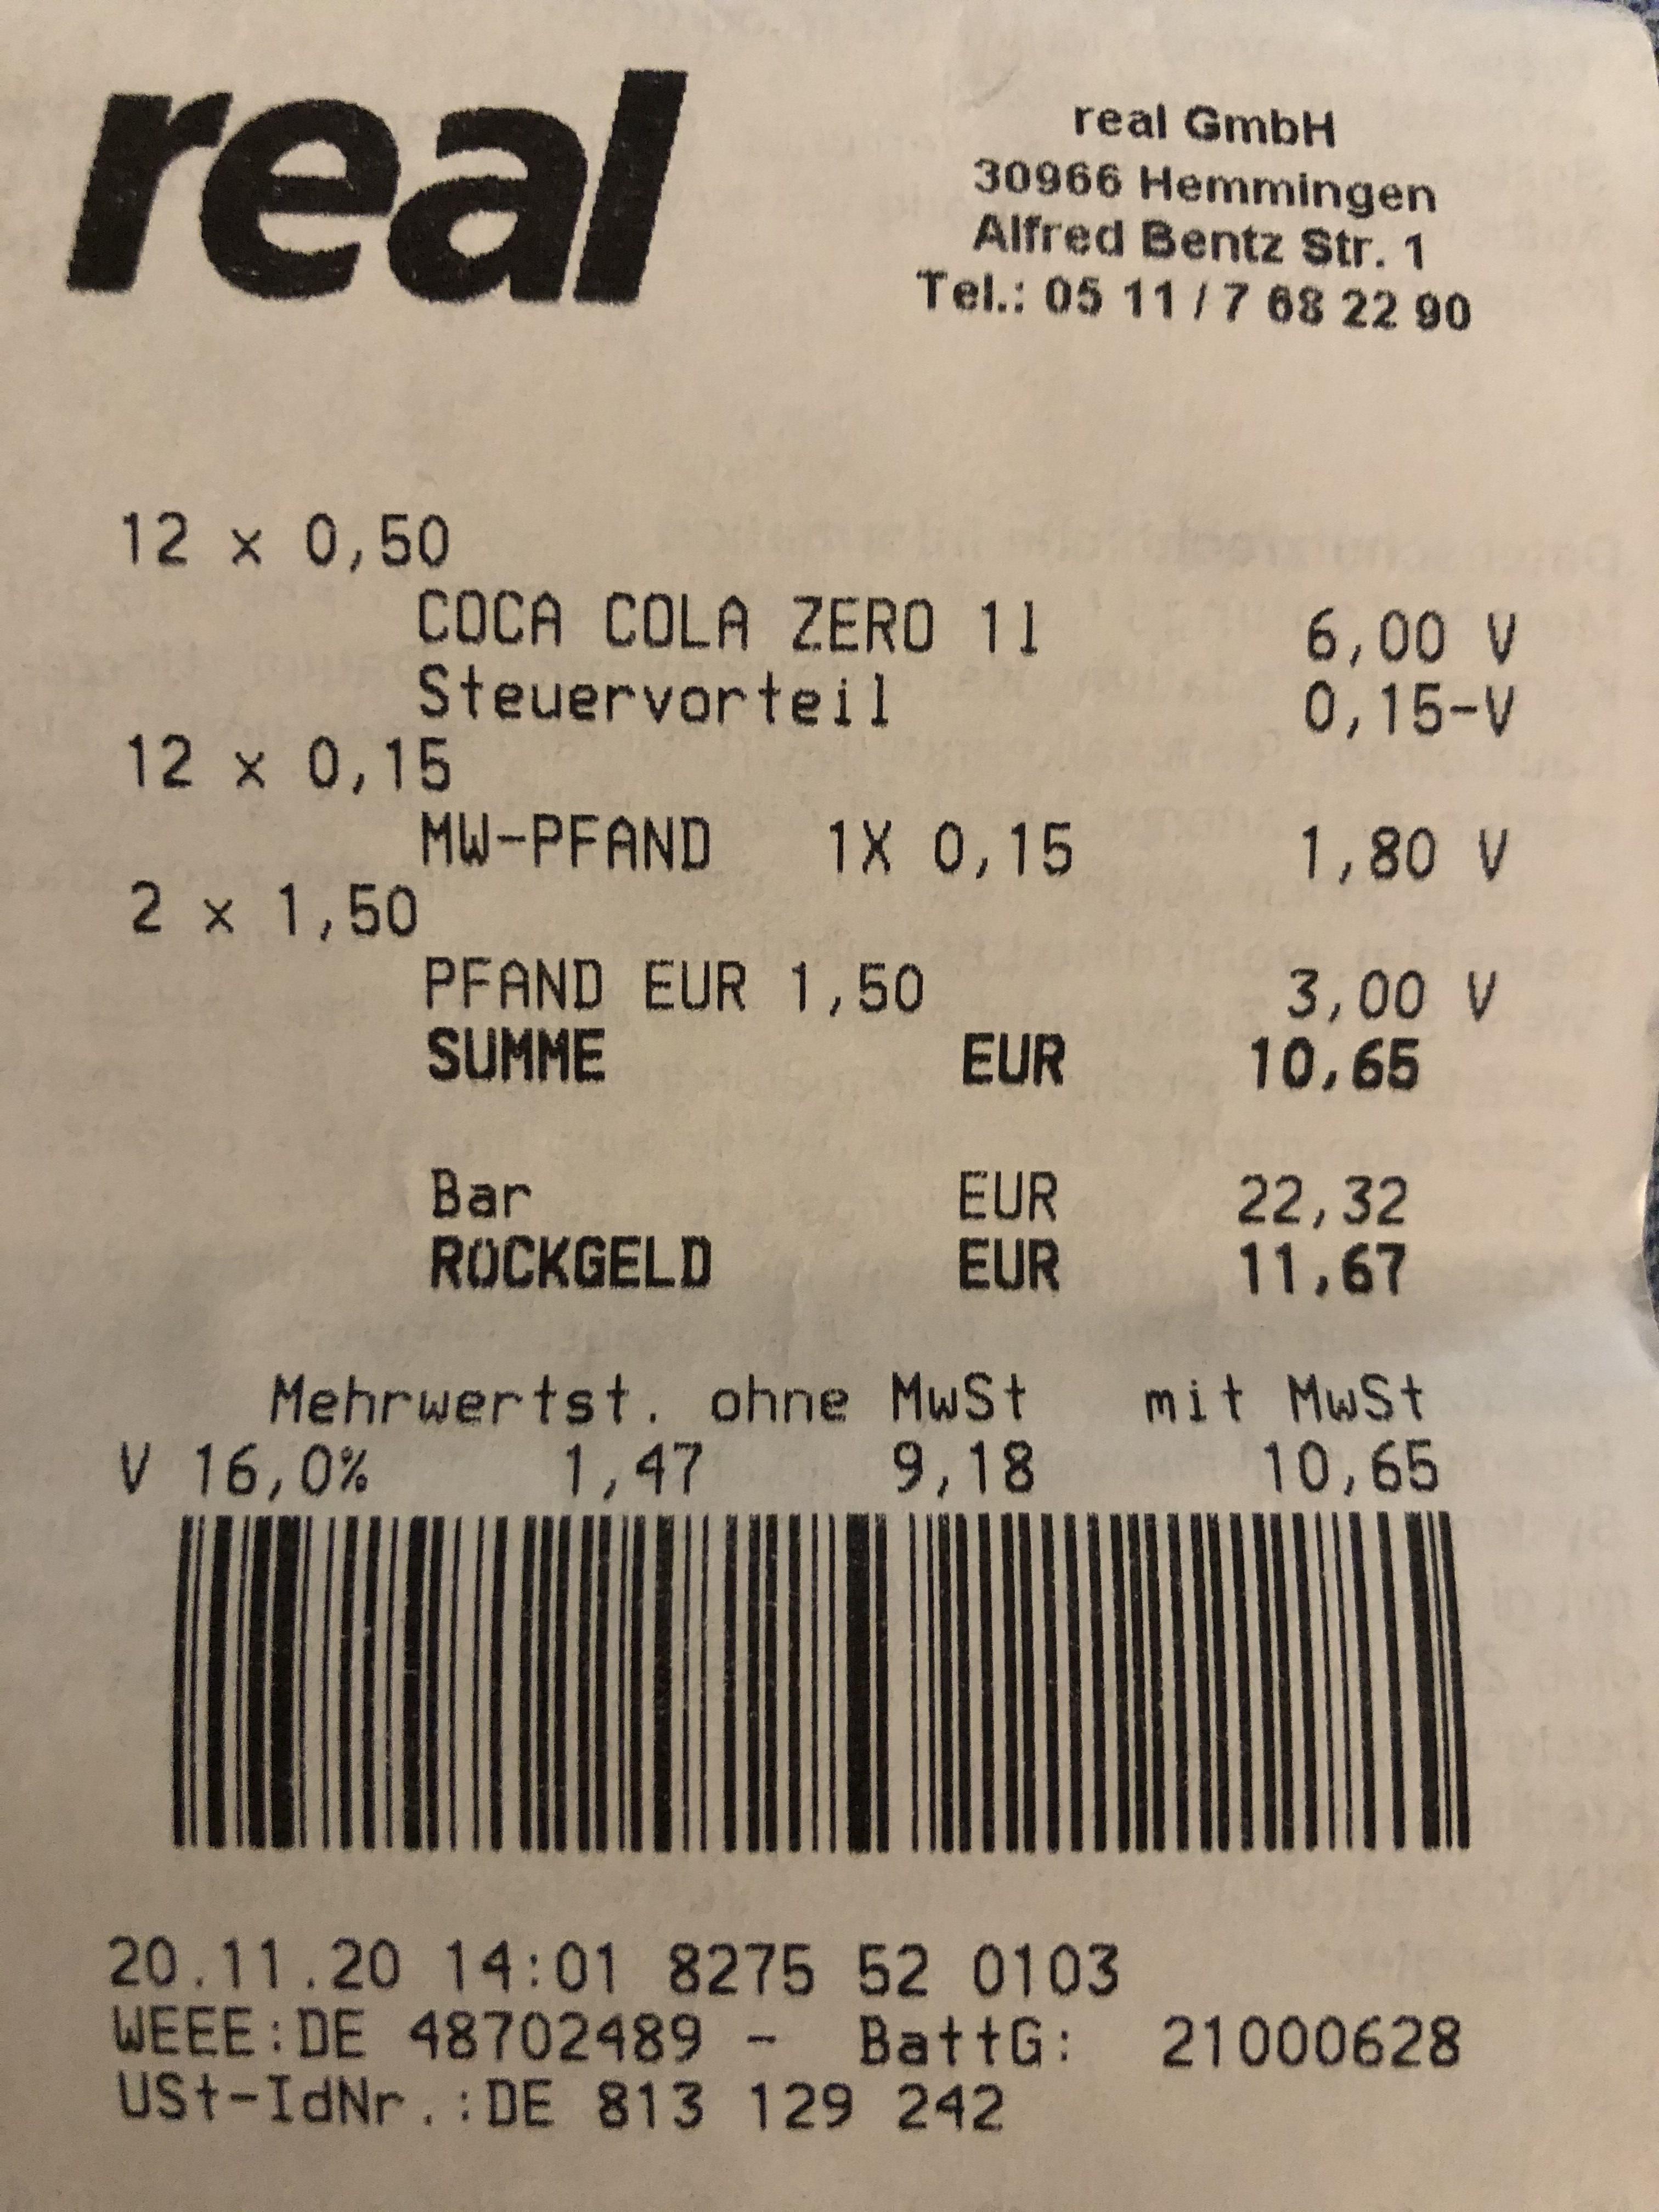 Lokal Real Hemmingen bei Hannover Coca Cola Zero 1 Liter Glasflasche